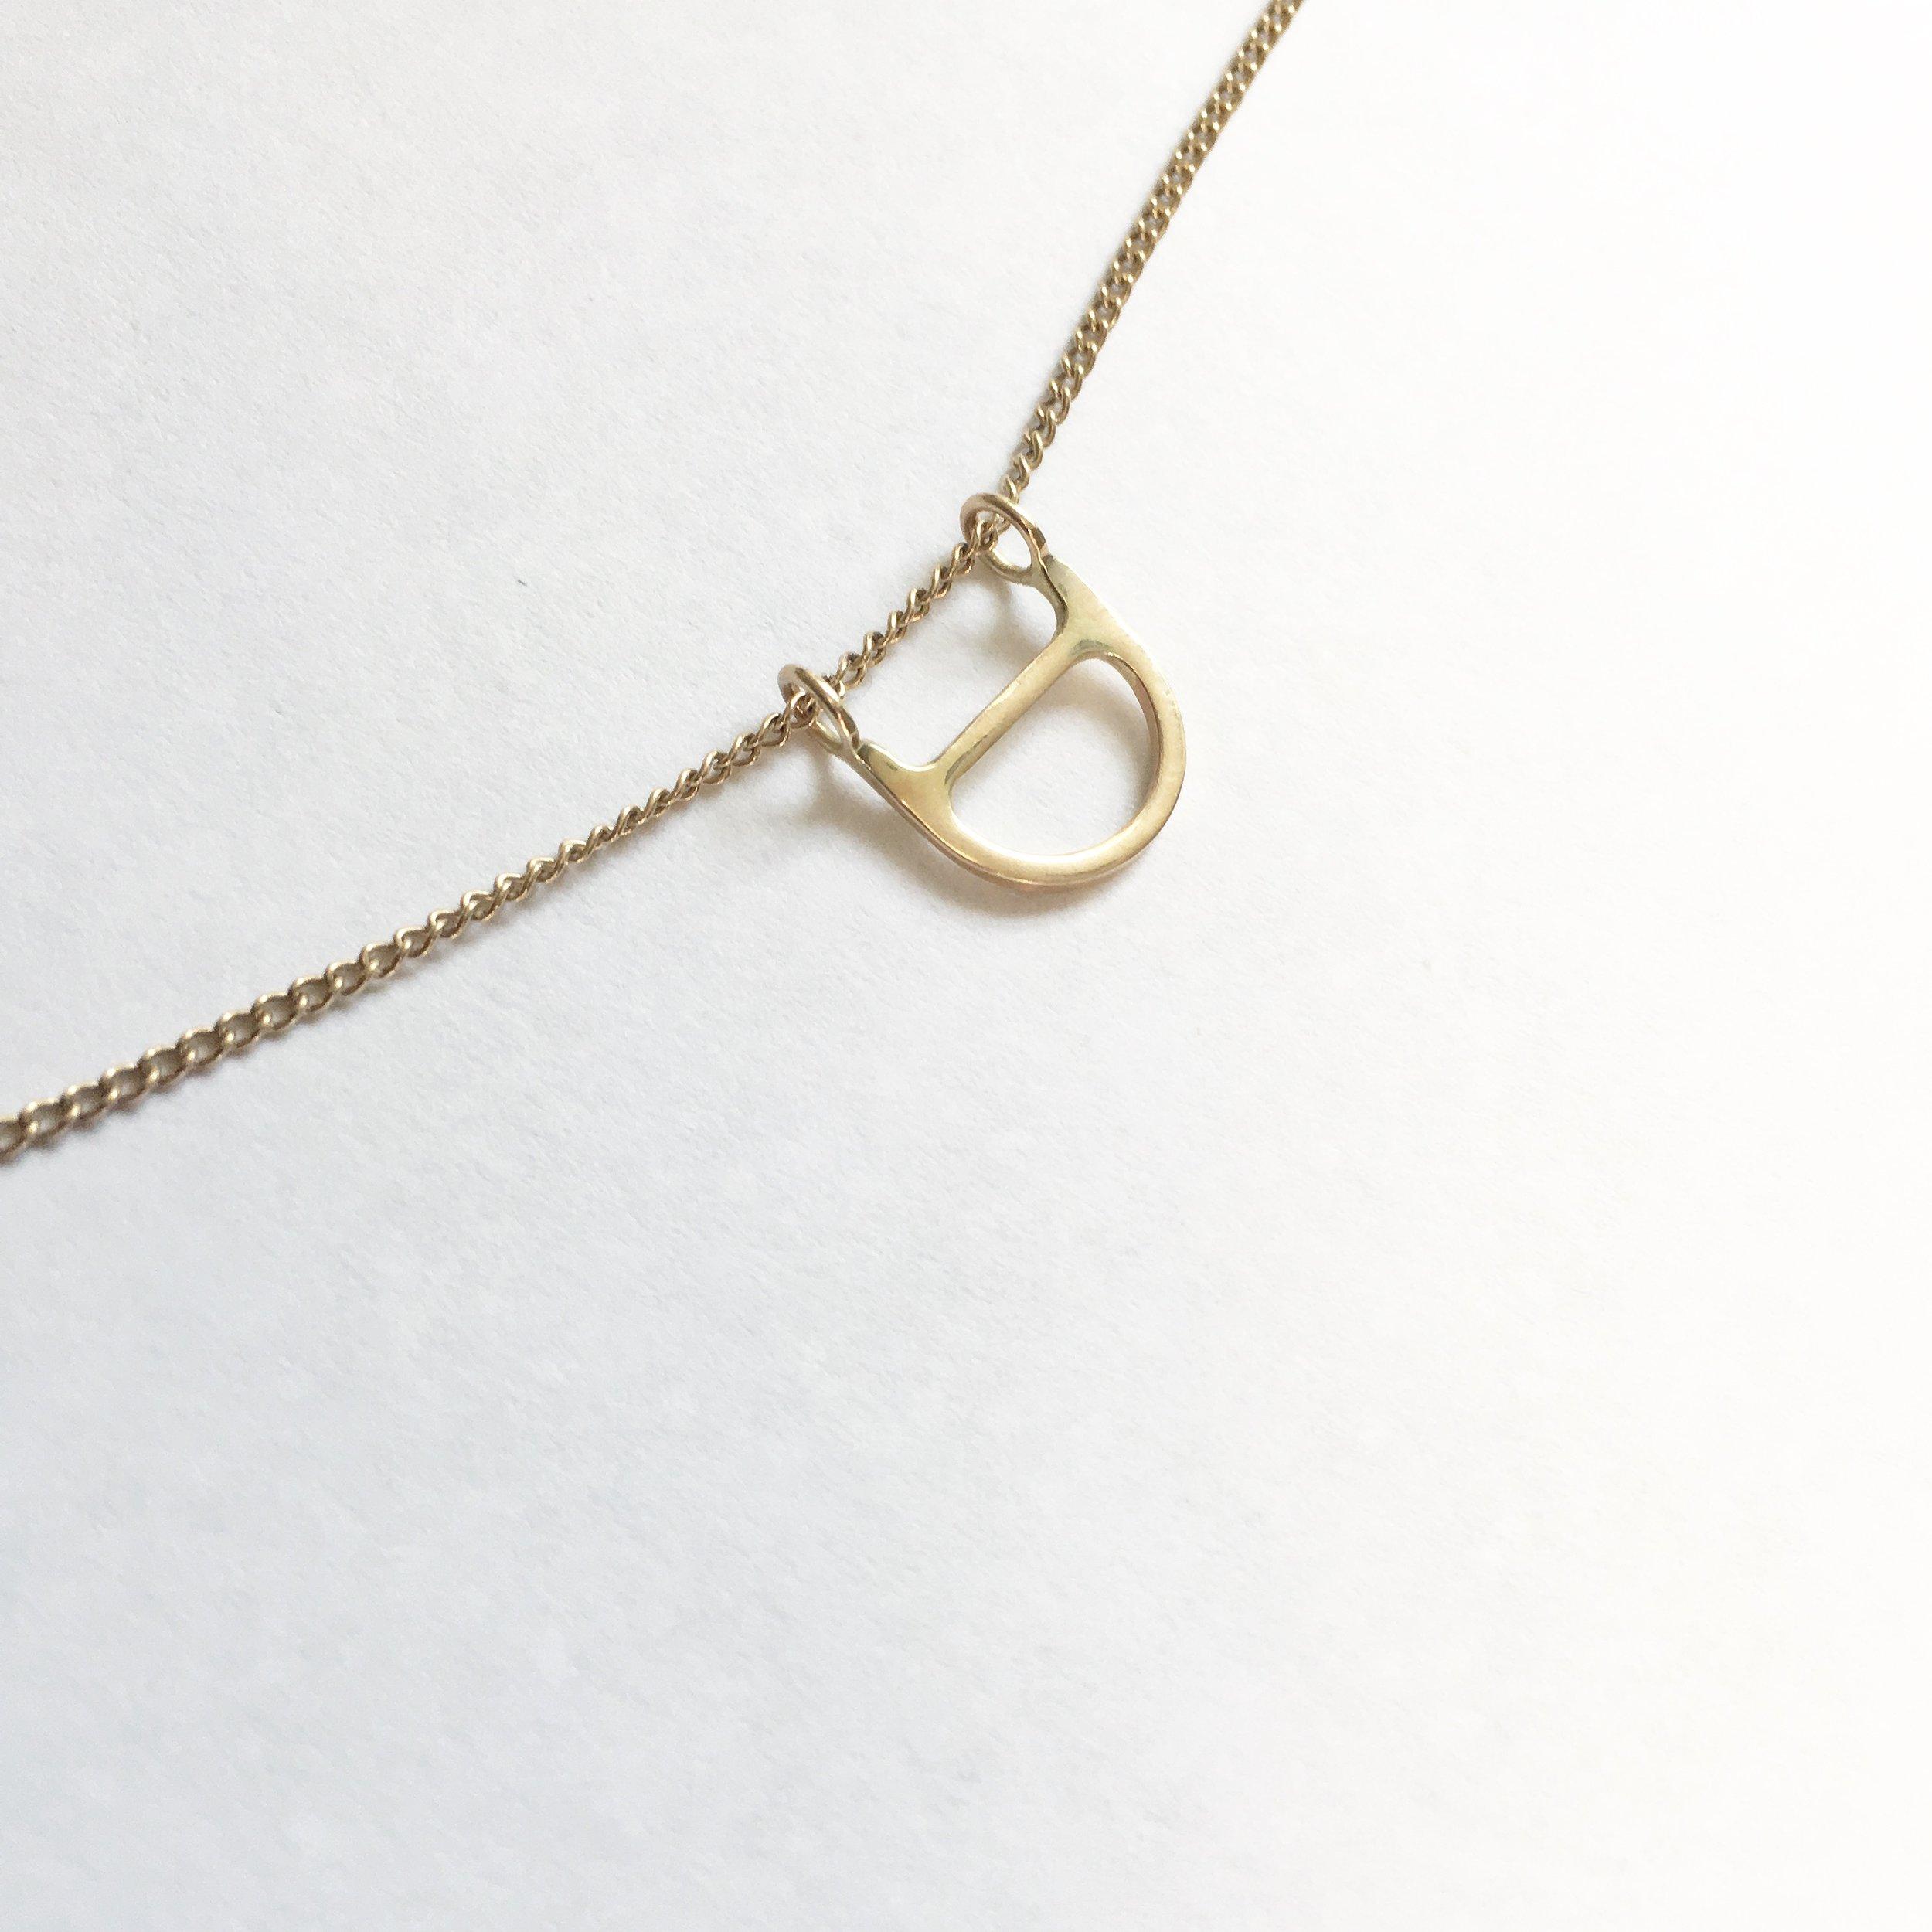 LUXE half round necklace